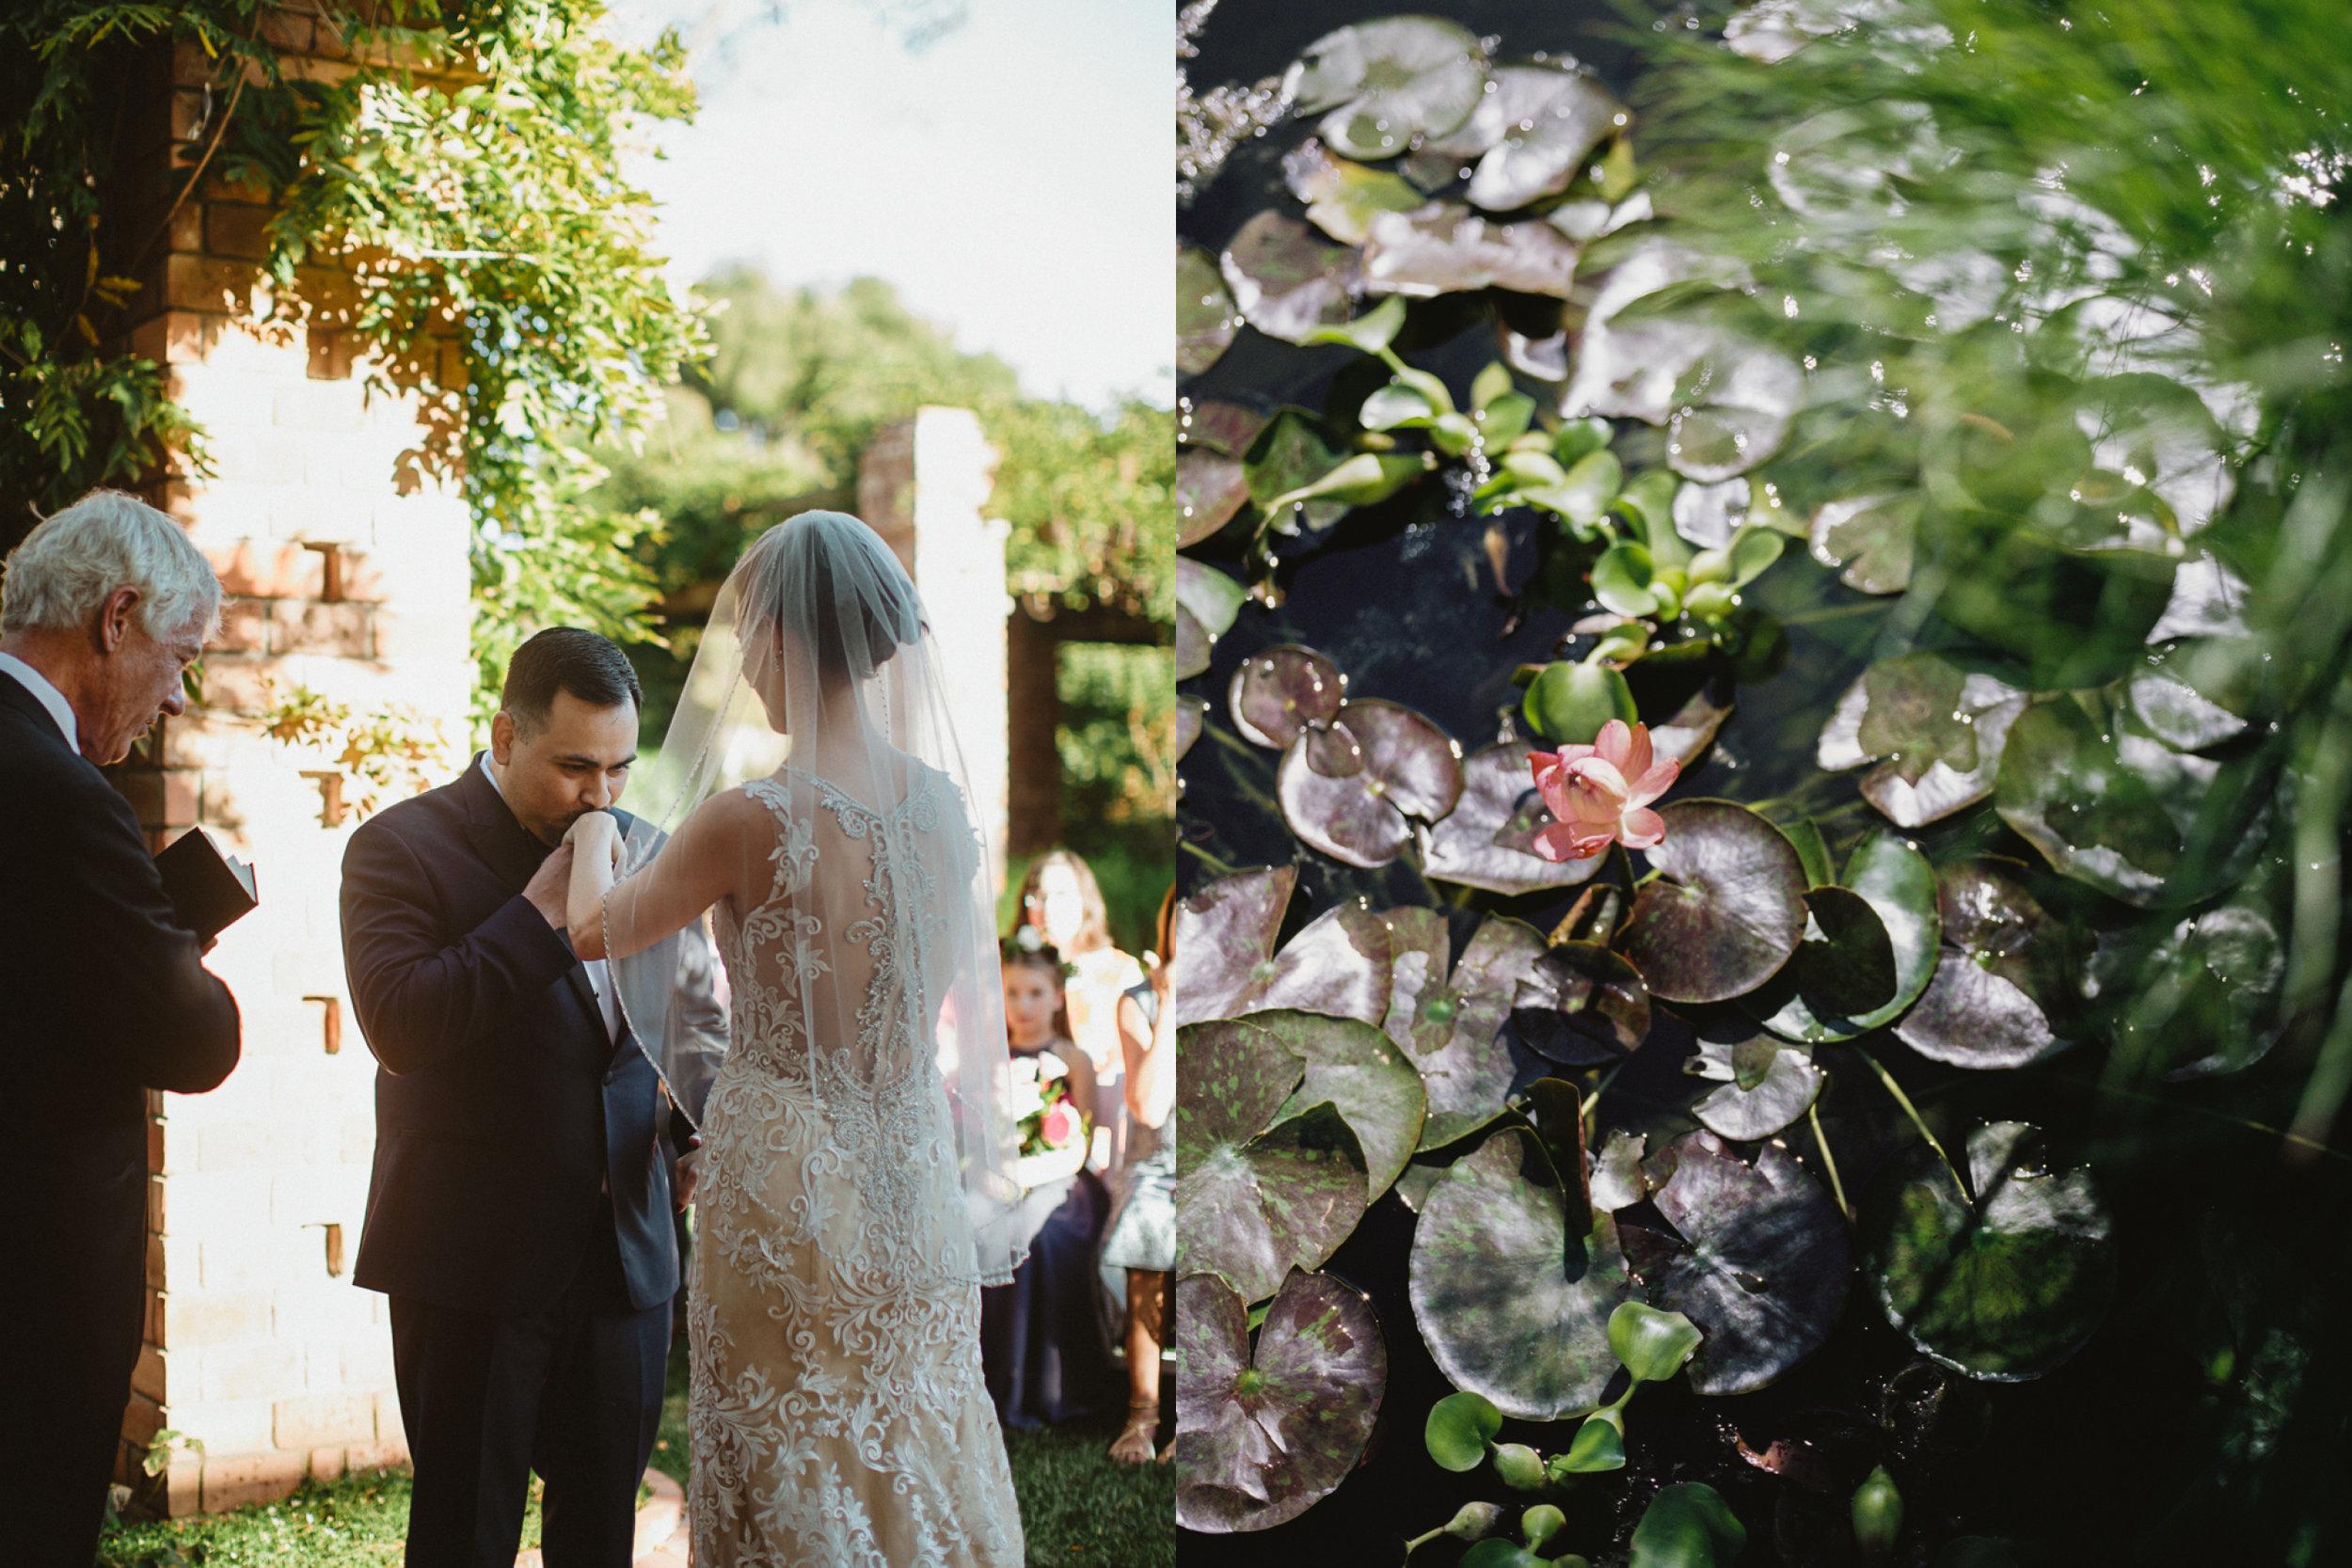 santa-barbara-elopement-elope-alegria-design-event-planner-coordinator-day-of-el-encanto-resort-lily-pond-wedding-intimate-red-maroon-city-ocean-view-rooftop (18).jpg